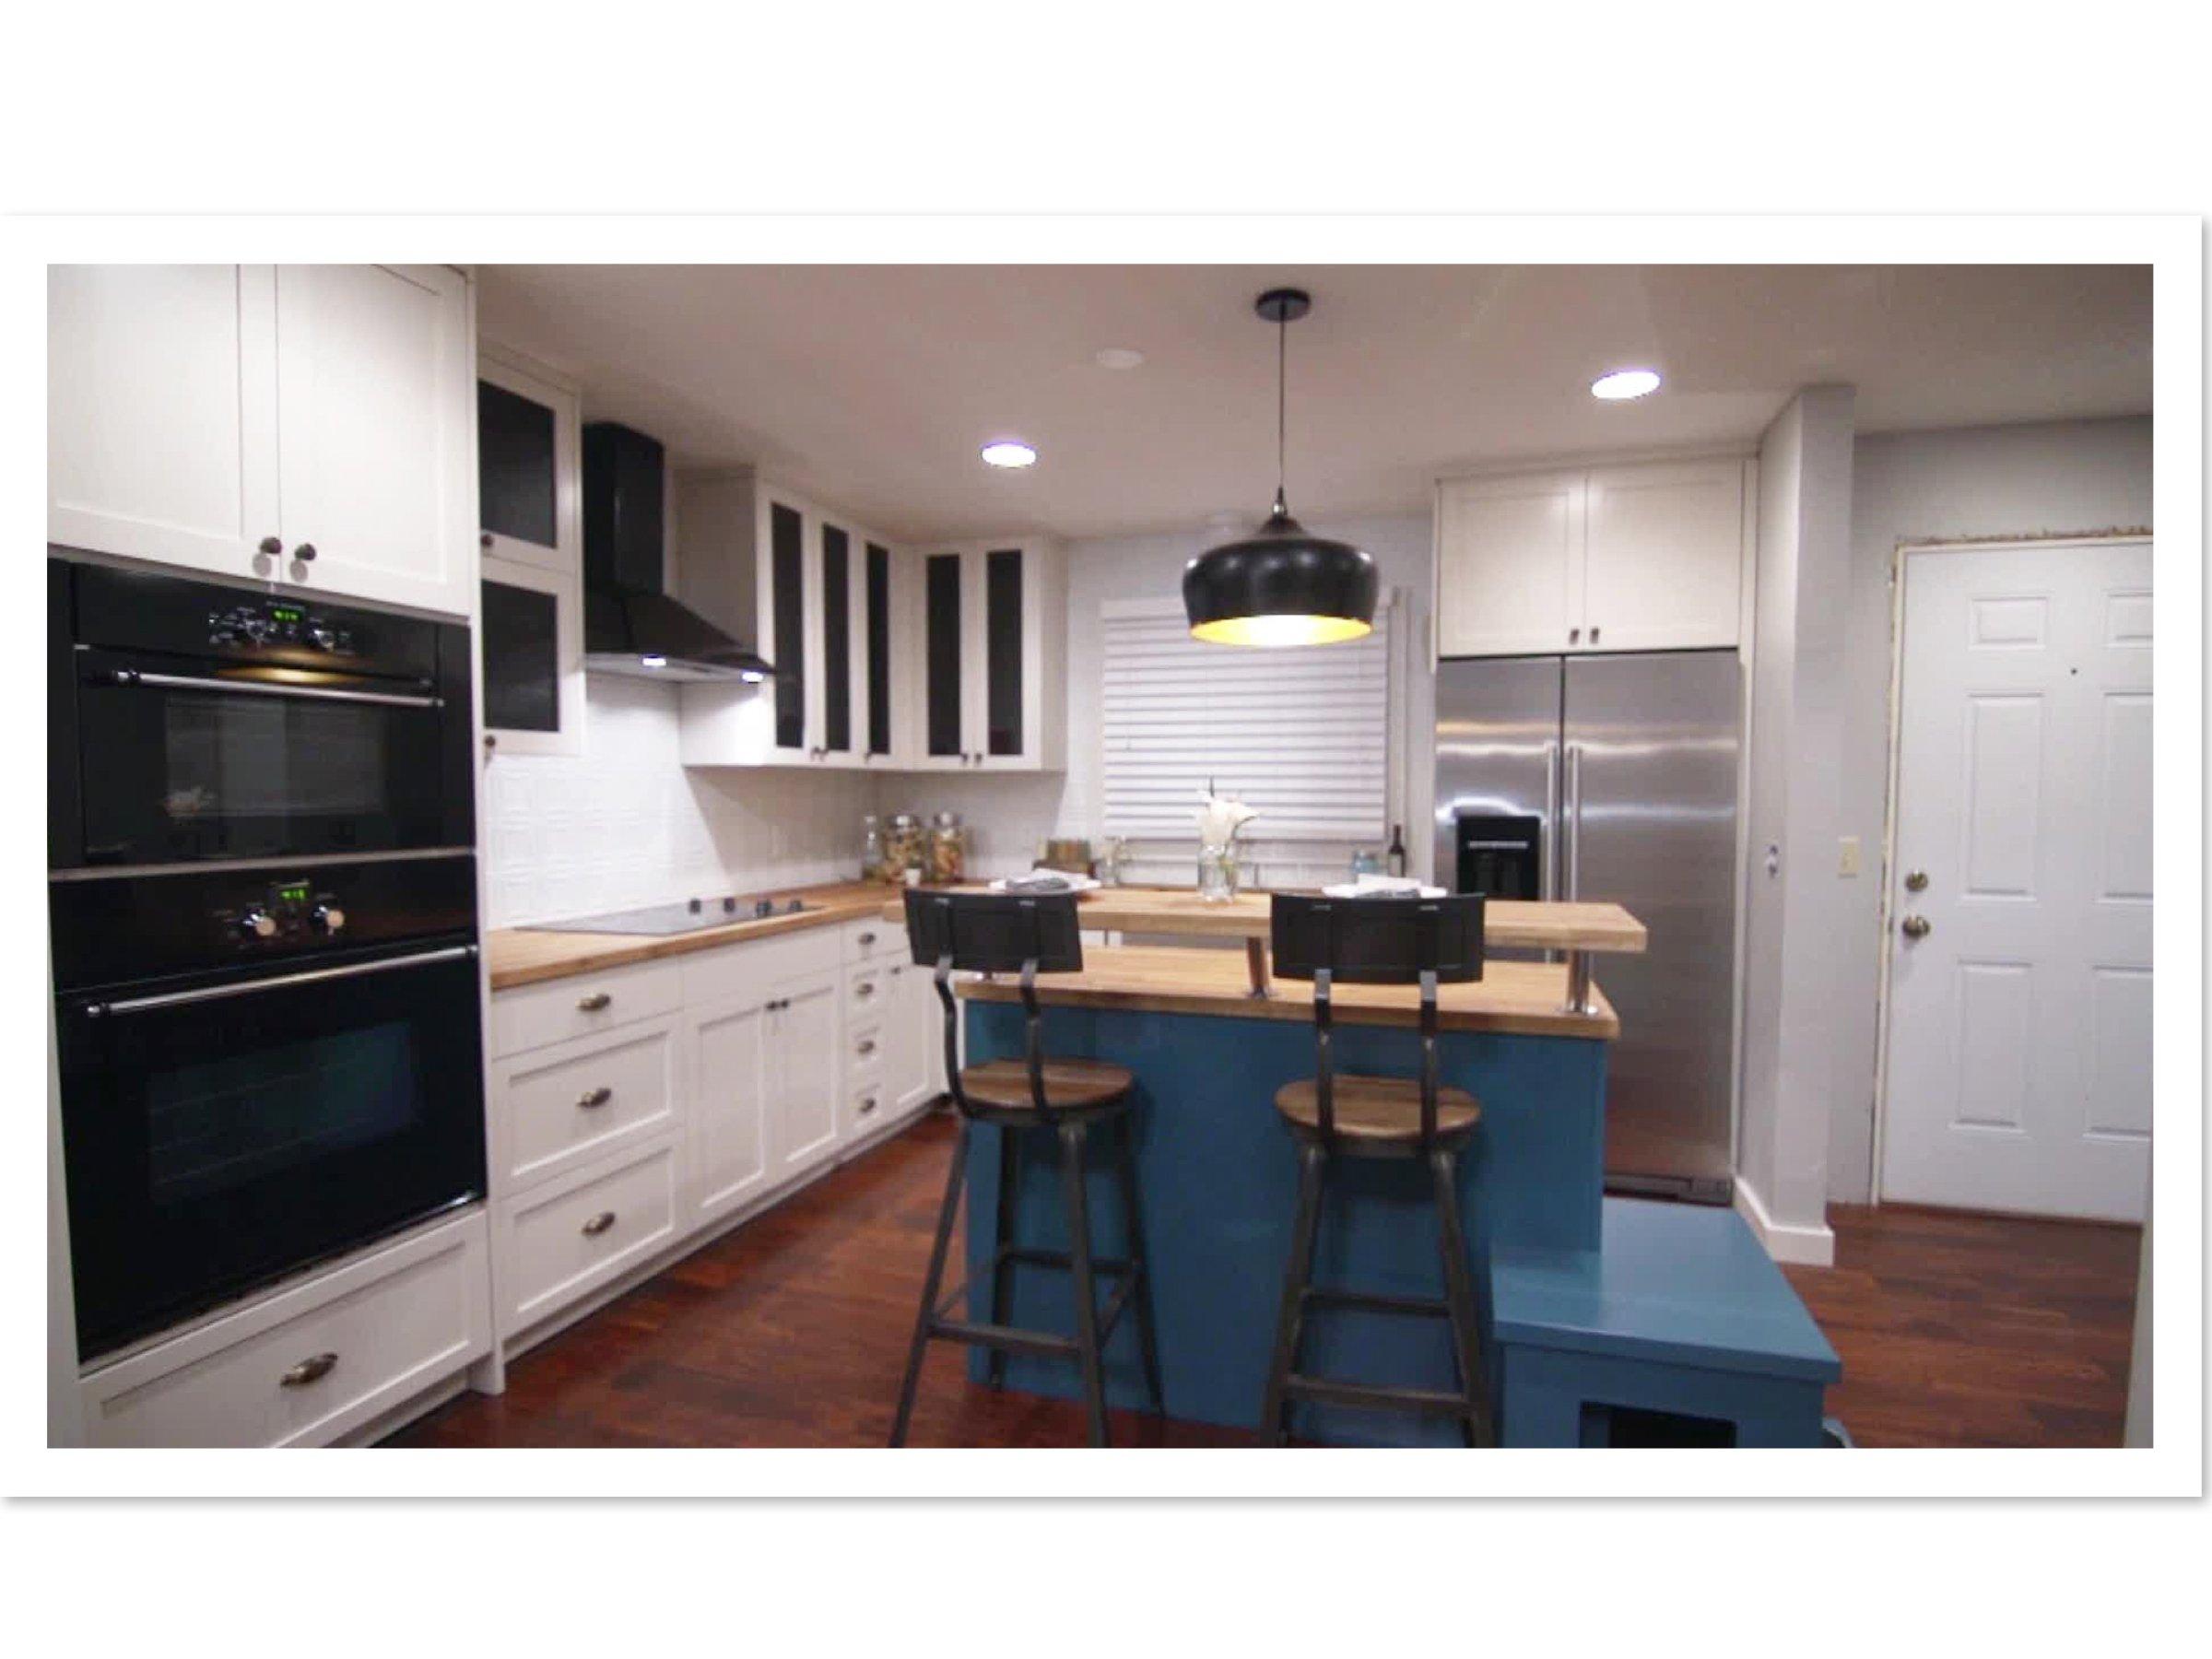 Ceiling Tile Ideas · Tin Kitchen Backsplash On HGTVu0027s Renovation Raiders